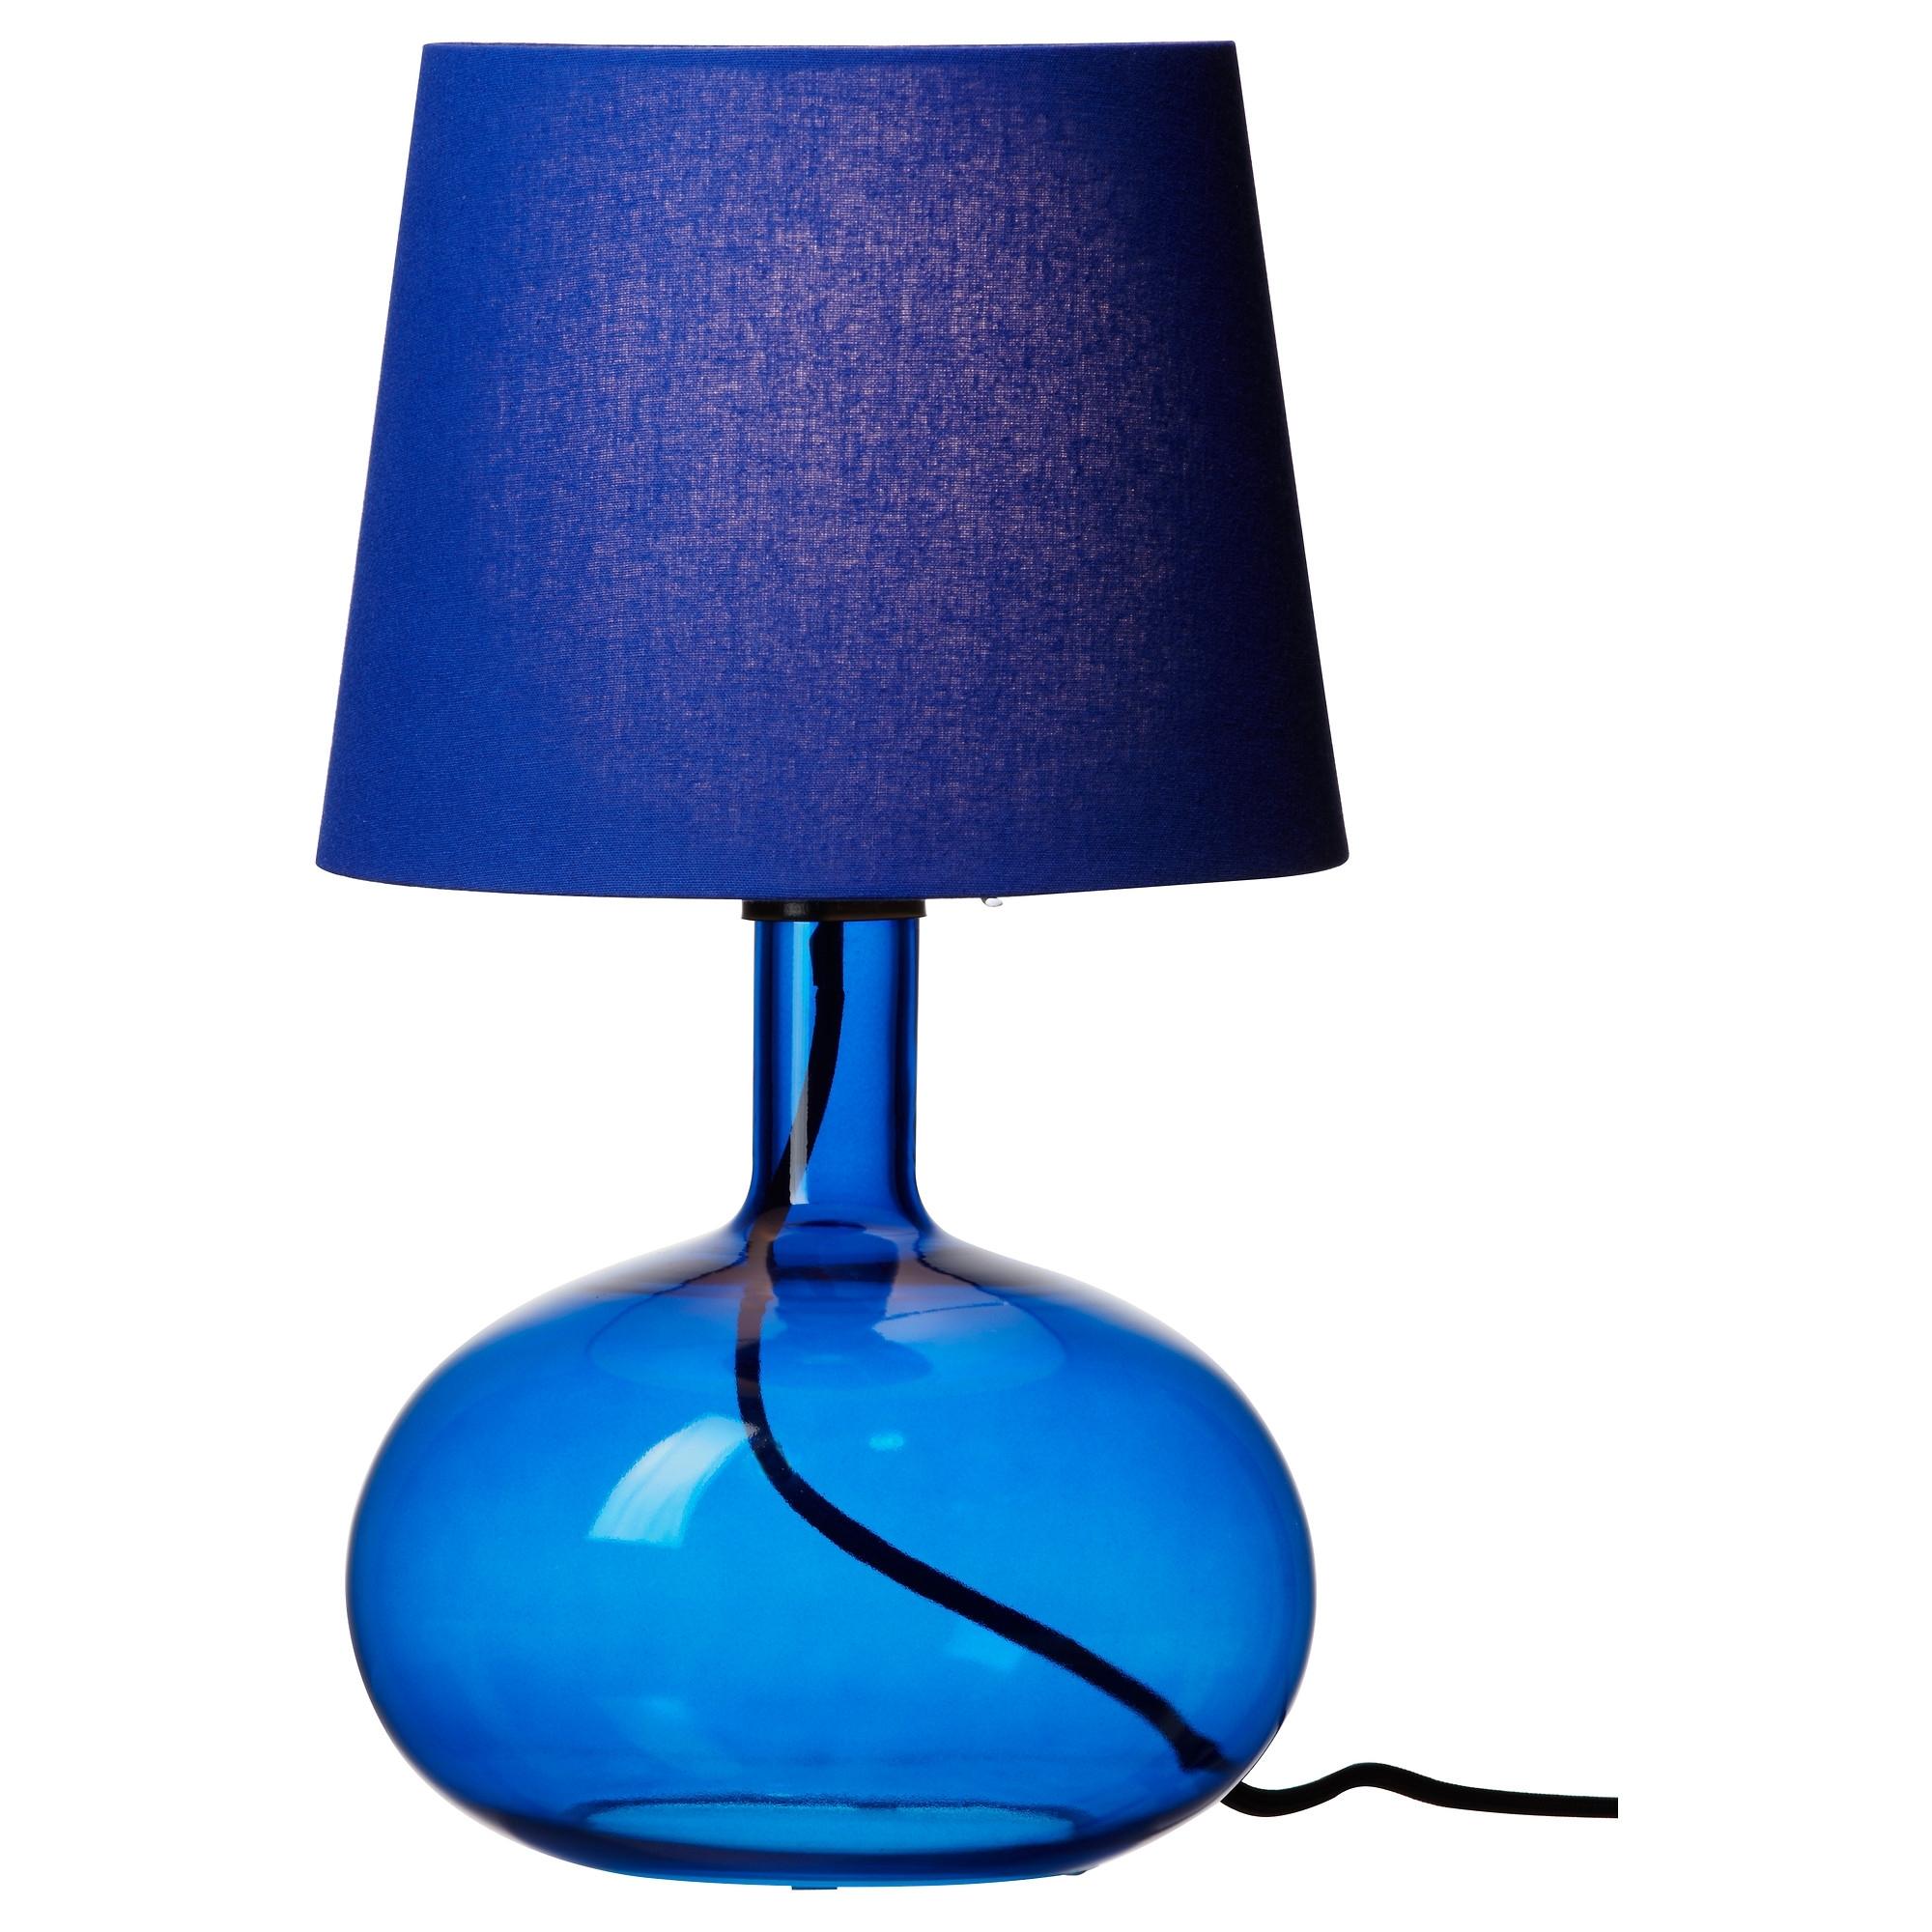 Inspiration about Ljusås Uvås Table Lamp – Ikea | Shoplinkz, Home | Shoplinkz, Lights For Living Room Table Lamps At Ikea (#9 of 15)